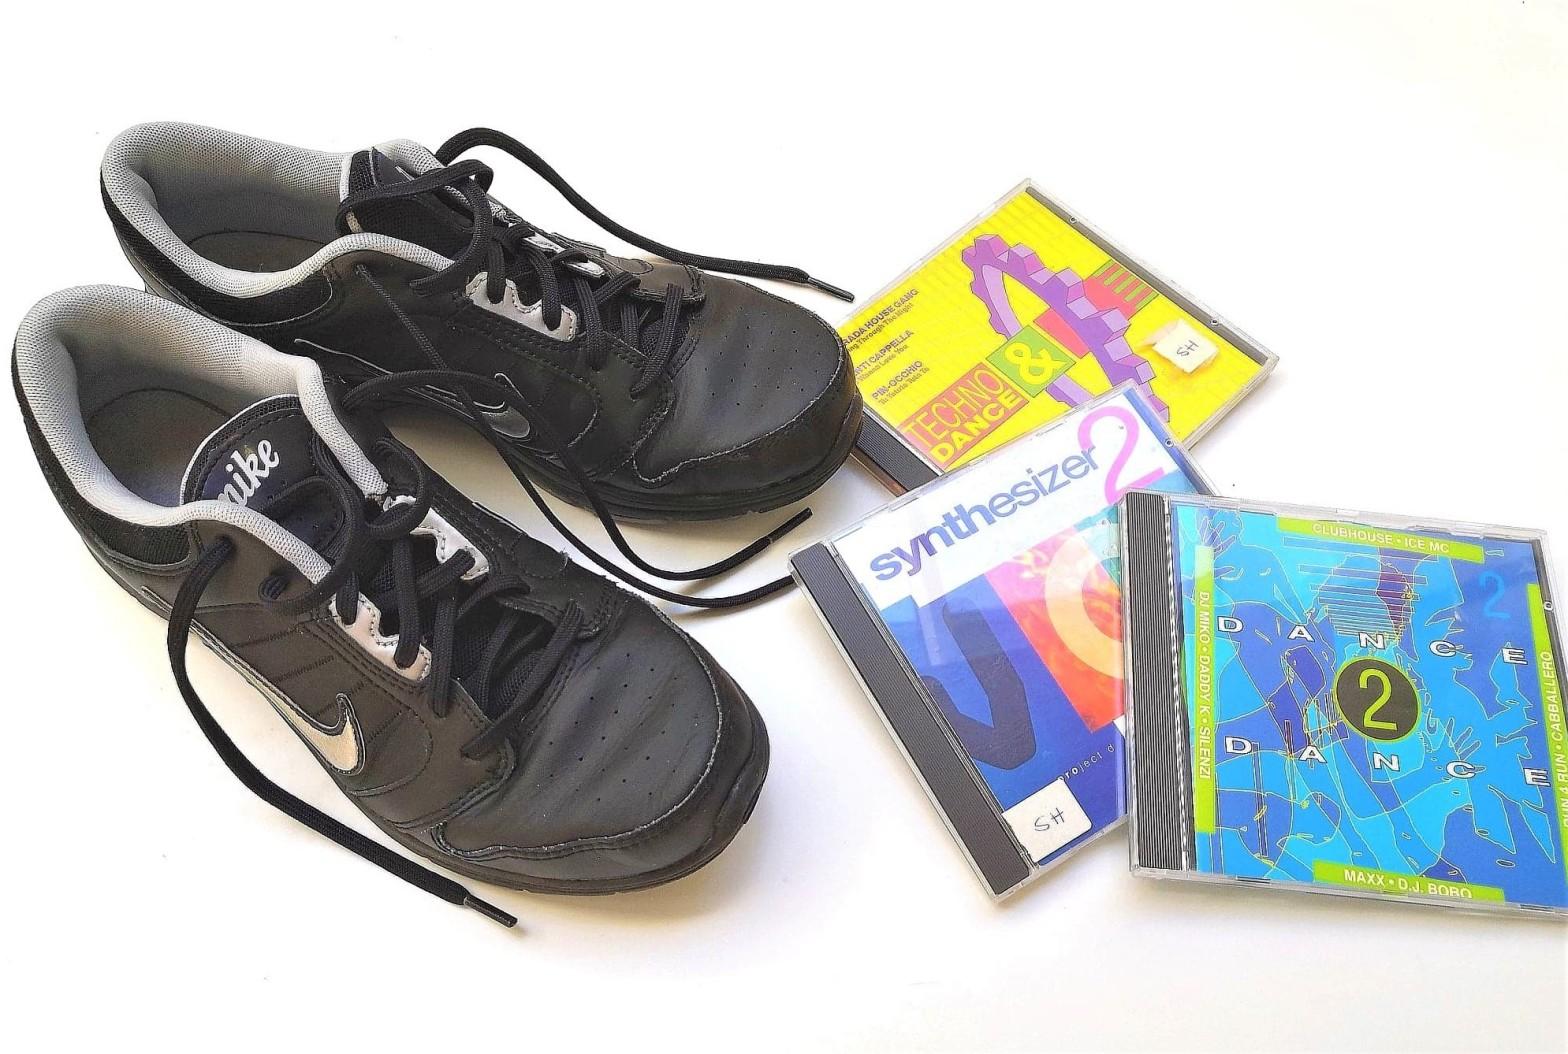 jumppatossut ja cd-levyjä